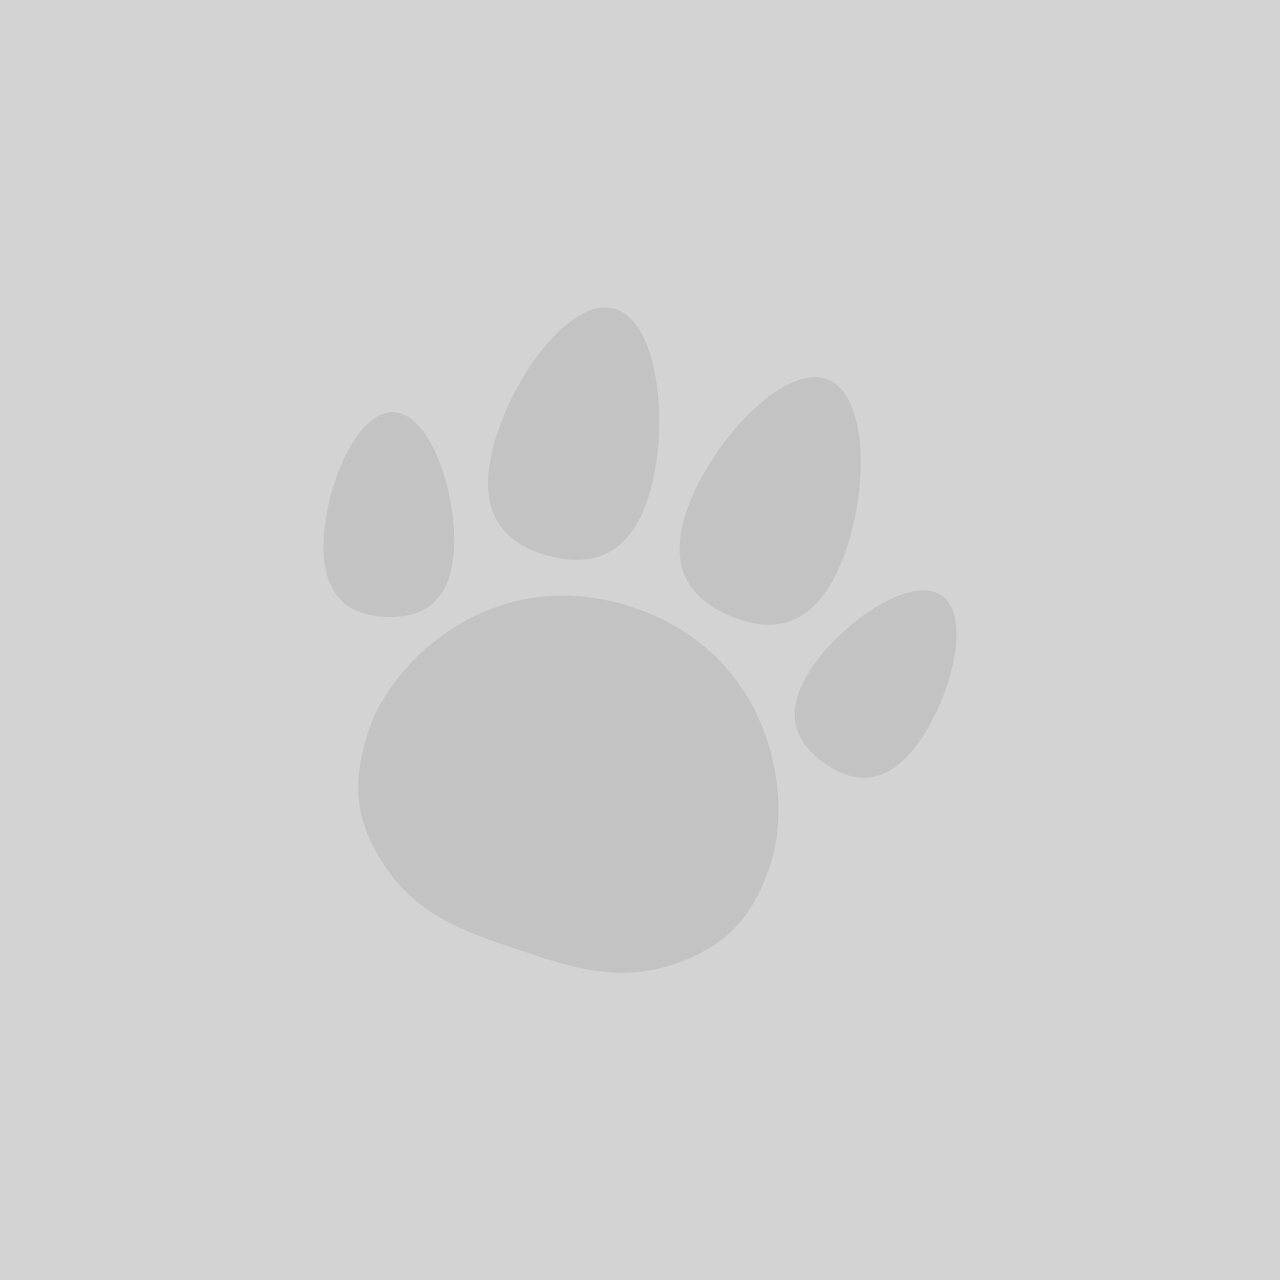 Flexi Classic Retractable Cord Medium Dog Lead 8m - Black